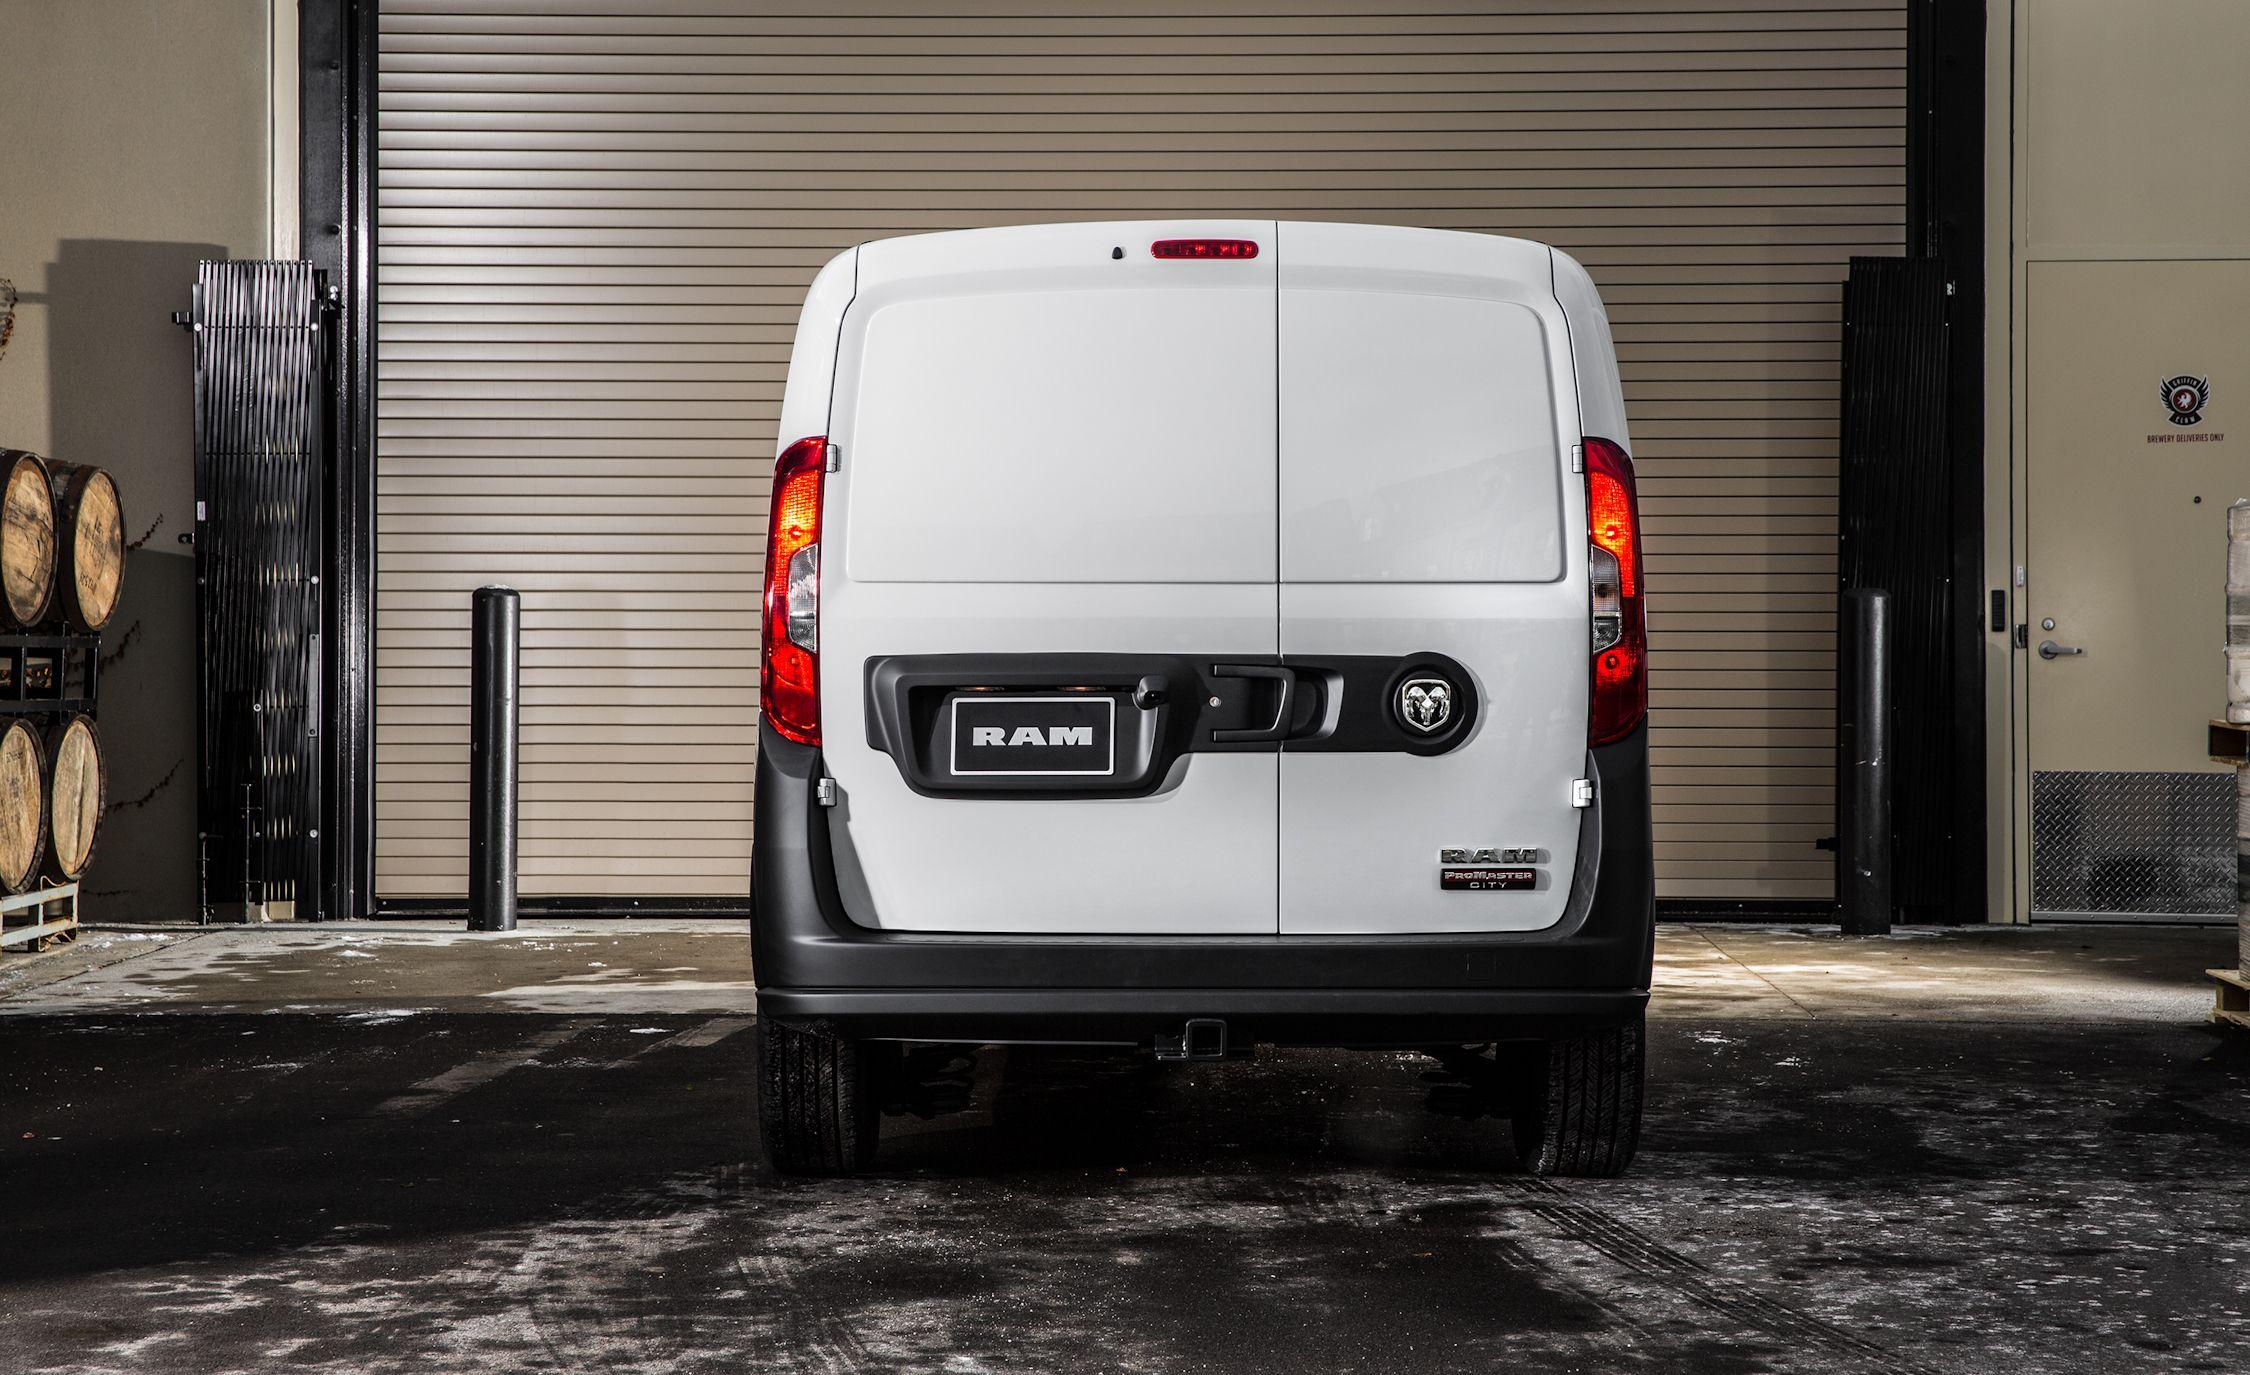 Ram Promaster City Reviews Price Photos And Nissan Primastar Fuse Box Manual Specs Car Driver